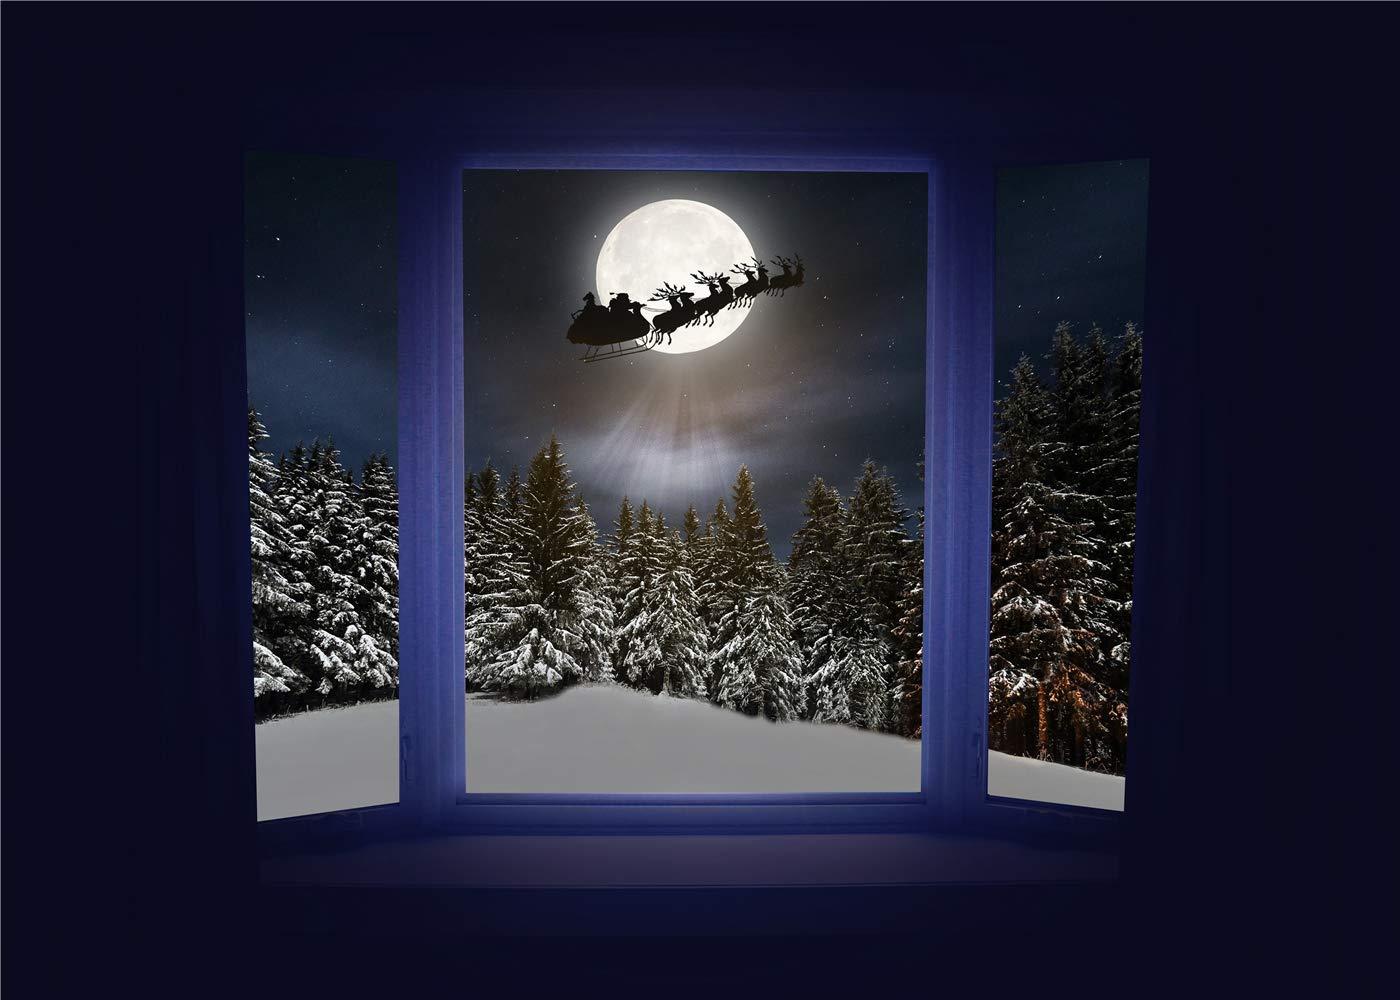 Christmas Backdrop Pine Tree Winter Snow Scene windowsill Outside The Window Fairy Tale Santa Claus Reindeer Moon Background